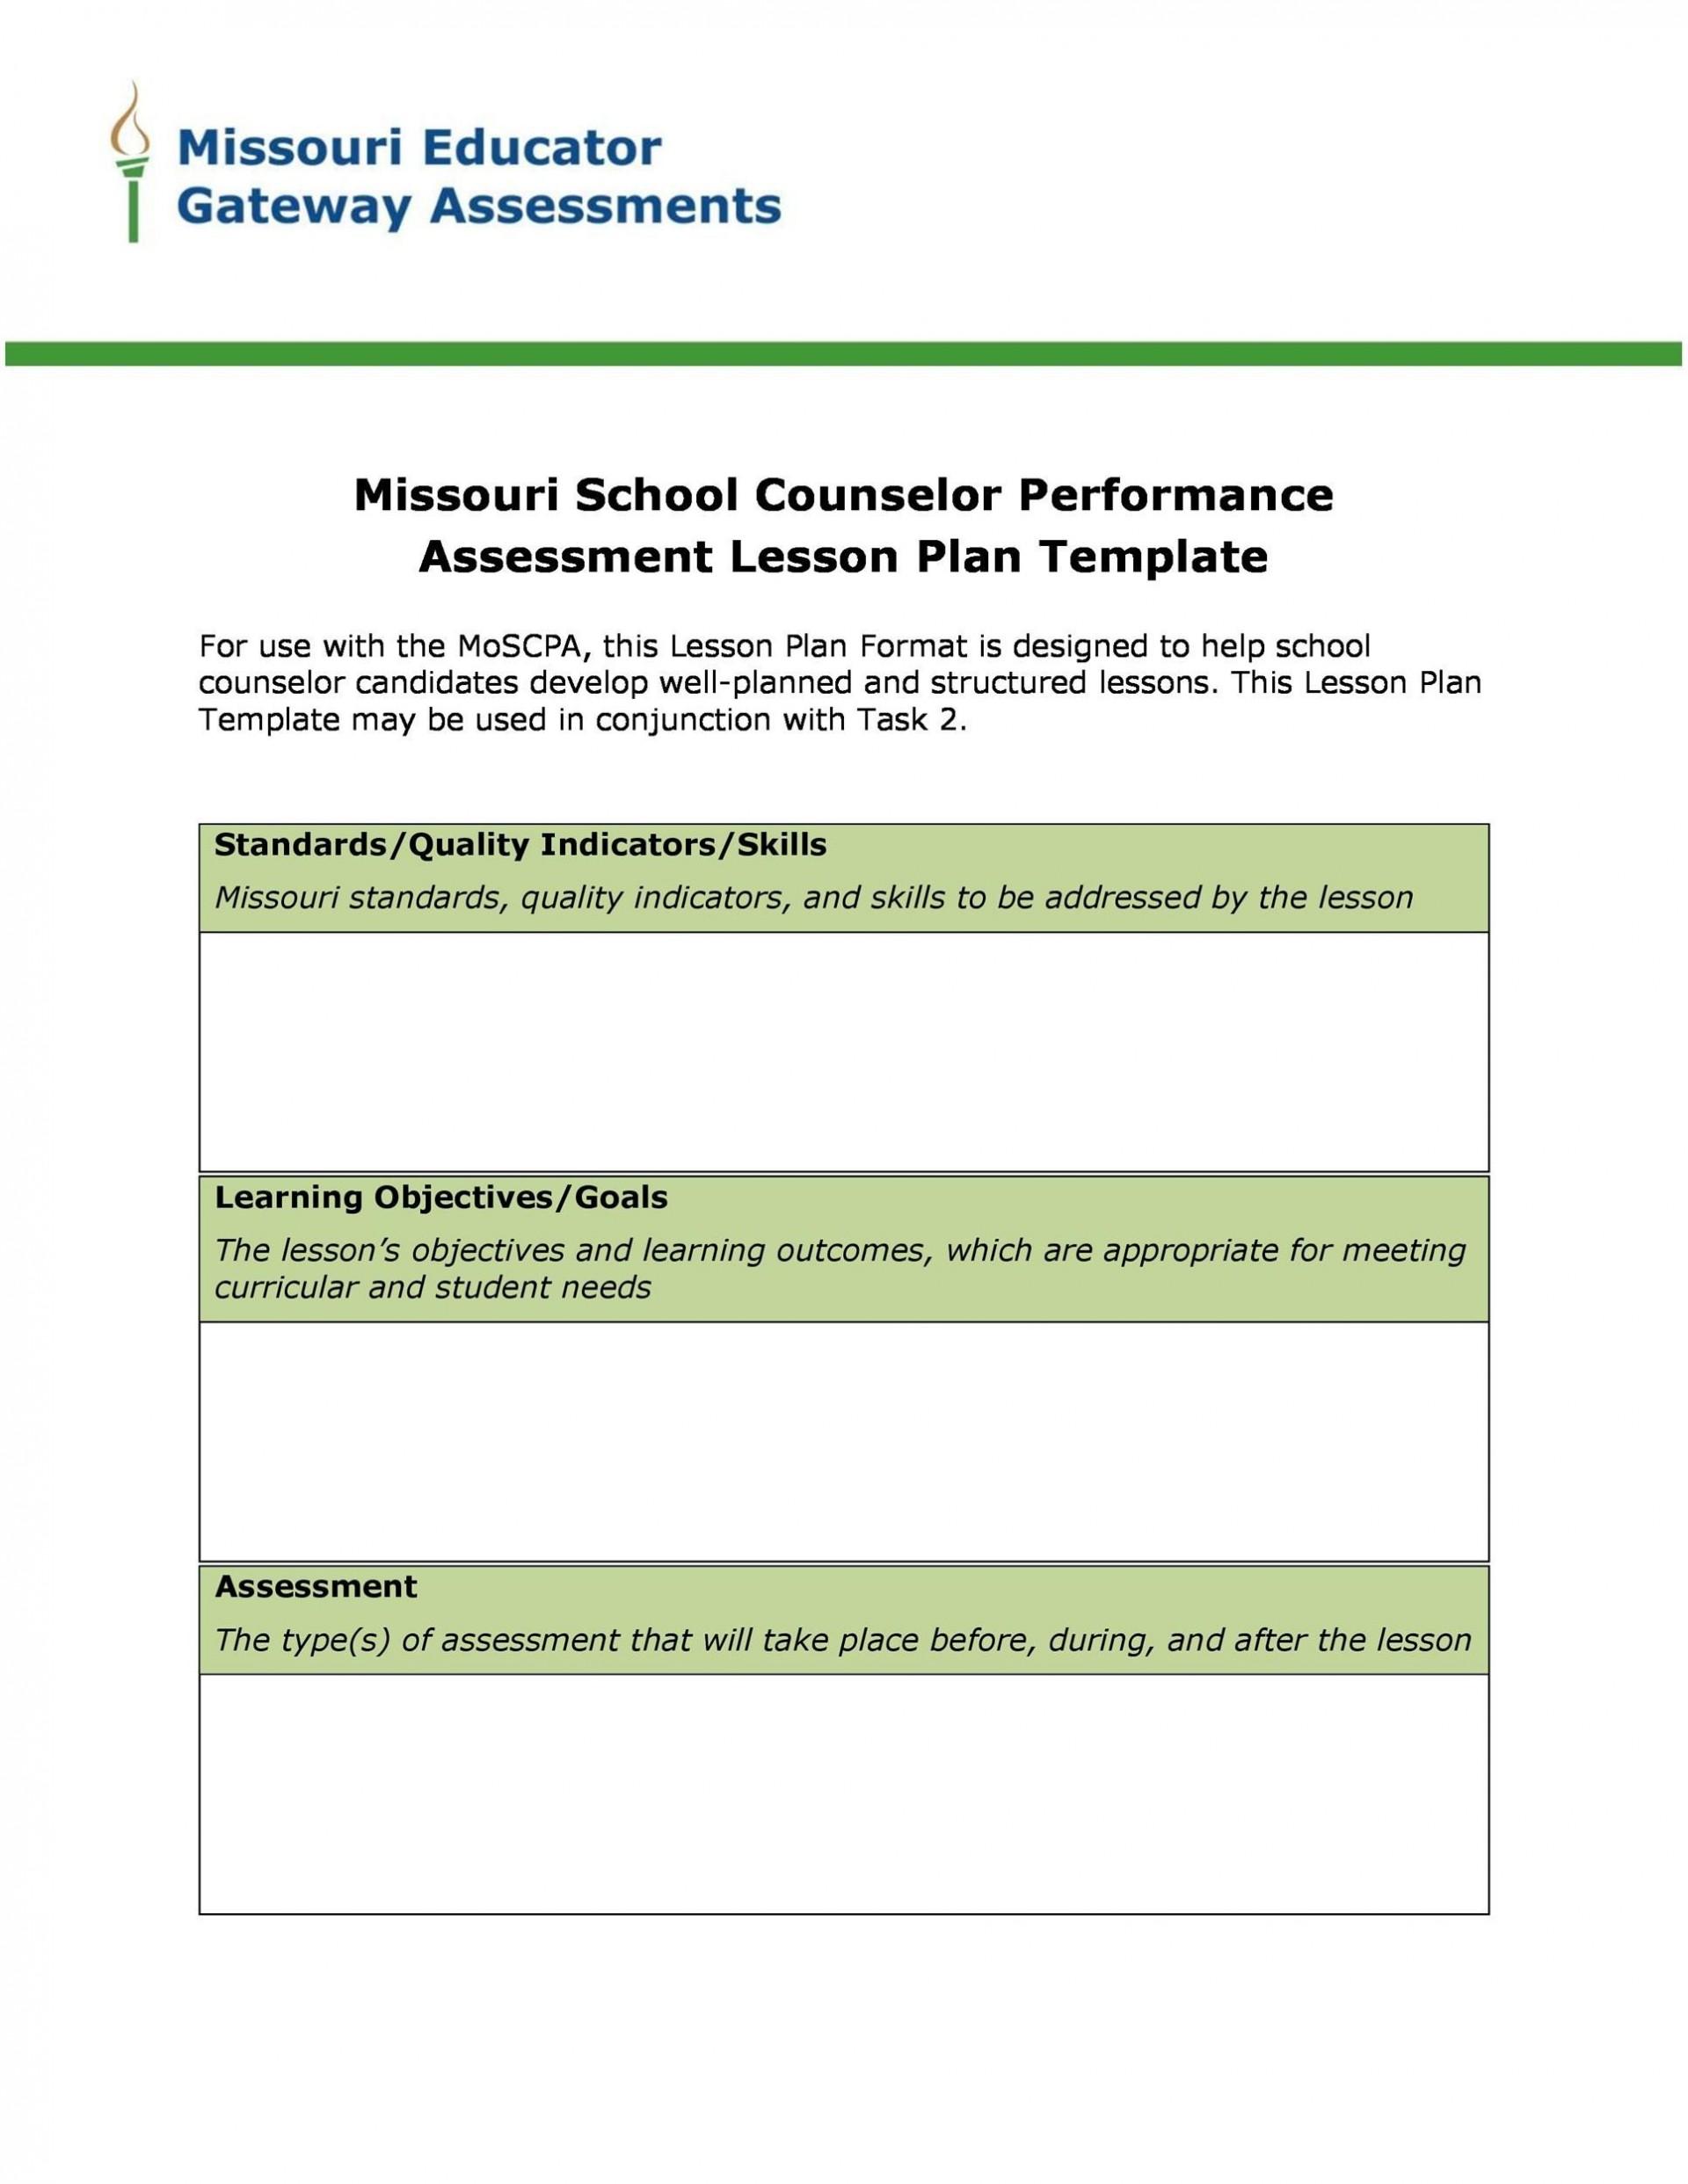 004 Astounding Weekly Lesson Plan Template Editable High Resolution  Google Doc Preschool Downloadable Free1920